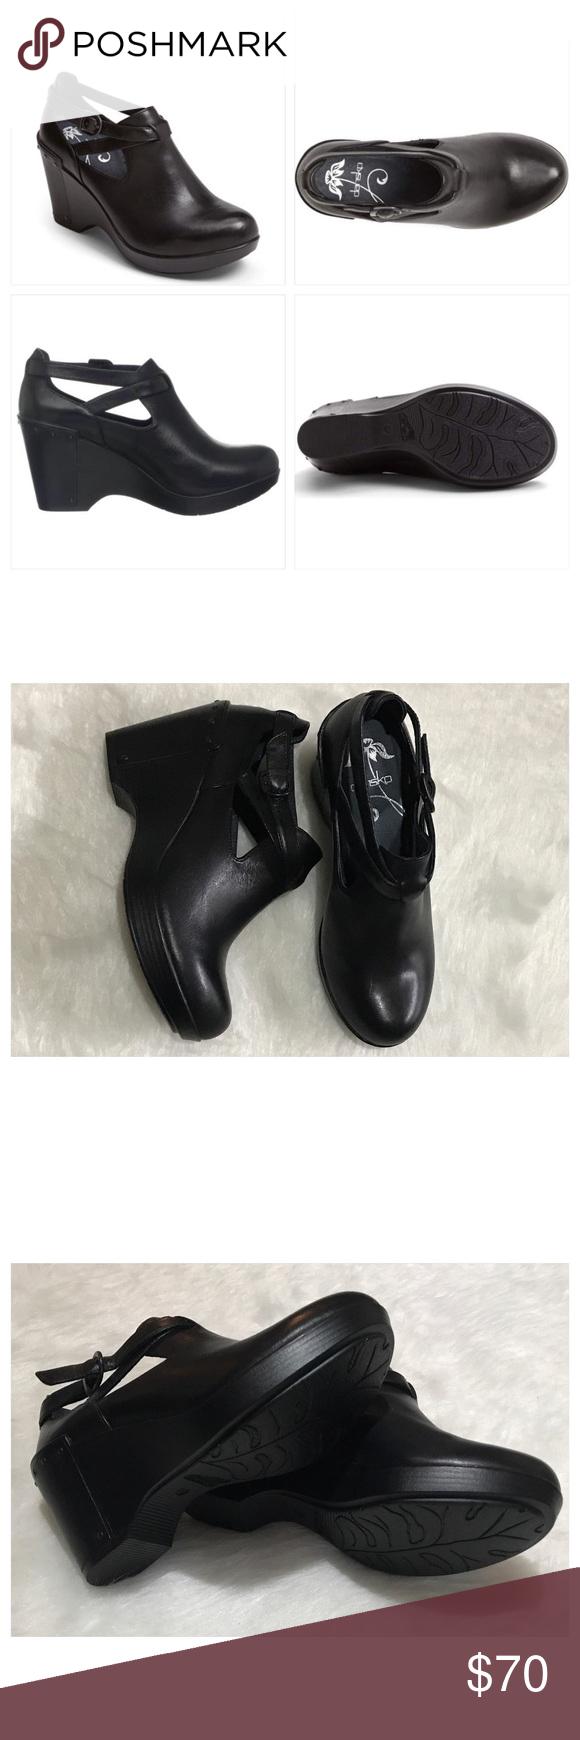 Dansk Franka shoe size 6 NWOB Dansko Shoes